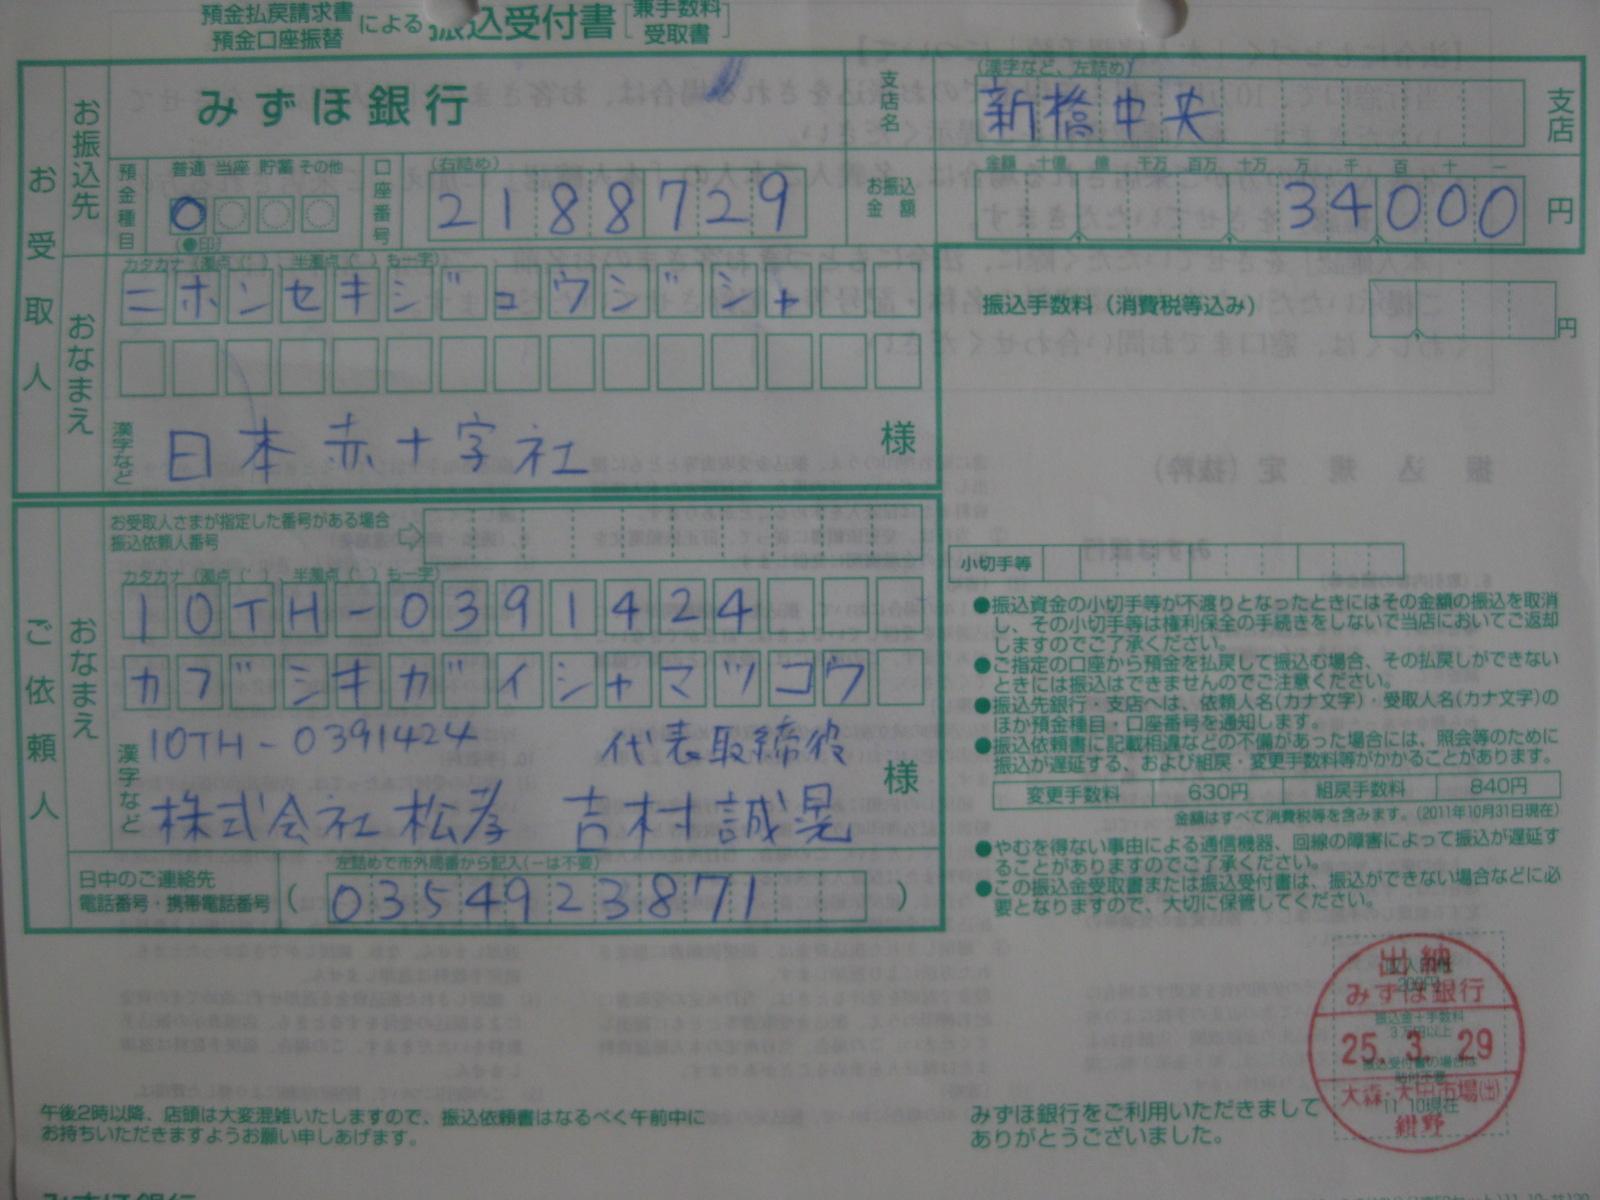 http://www.go-nippon.com/news/images/13%E5%B9%B42%E6%9C%88%E5%88%86.JPG